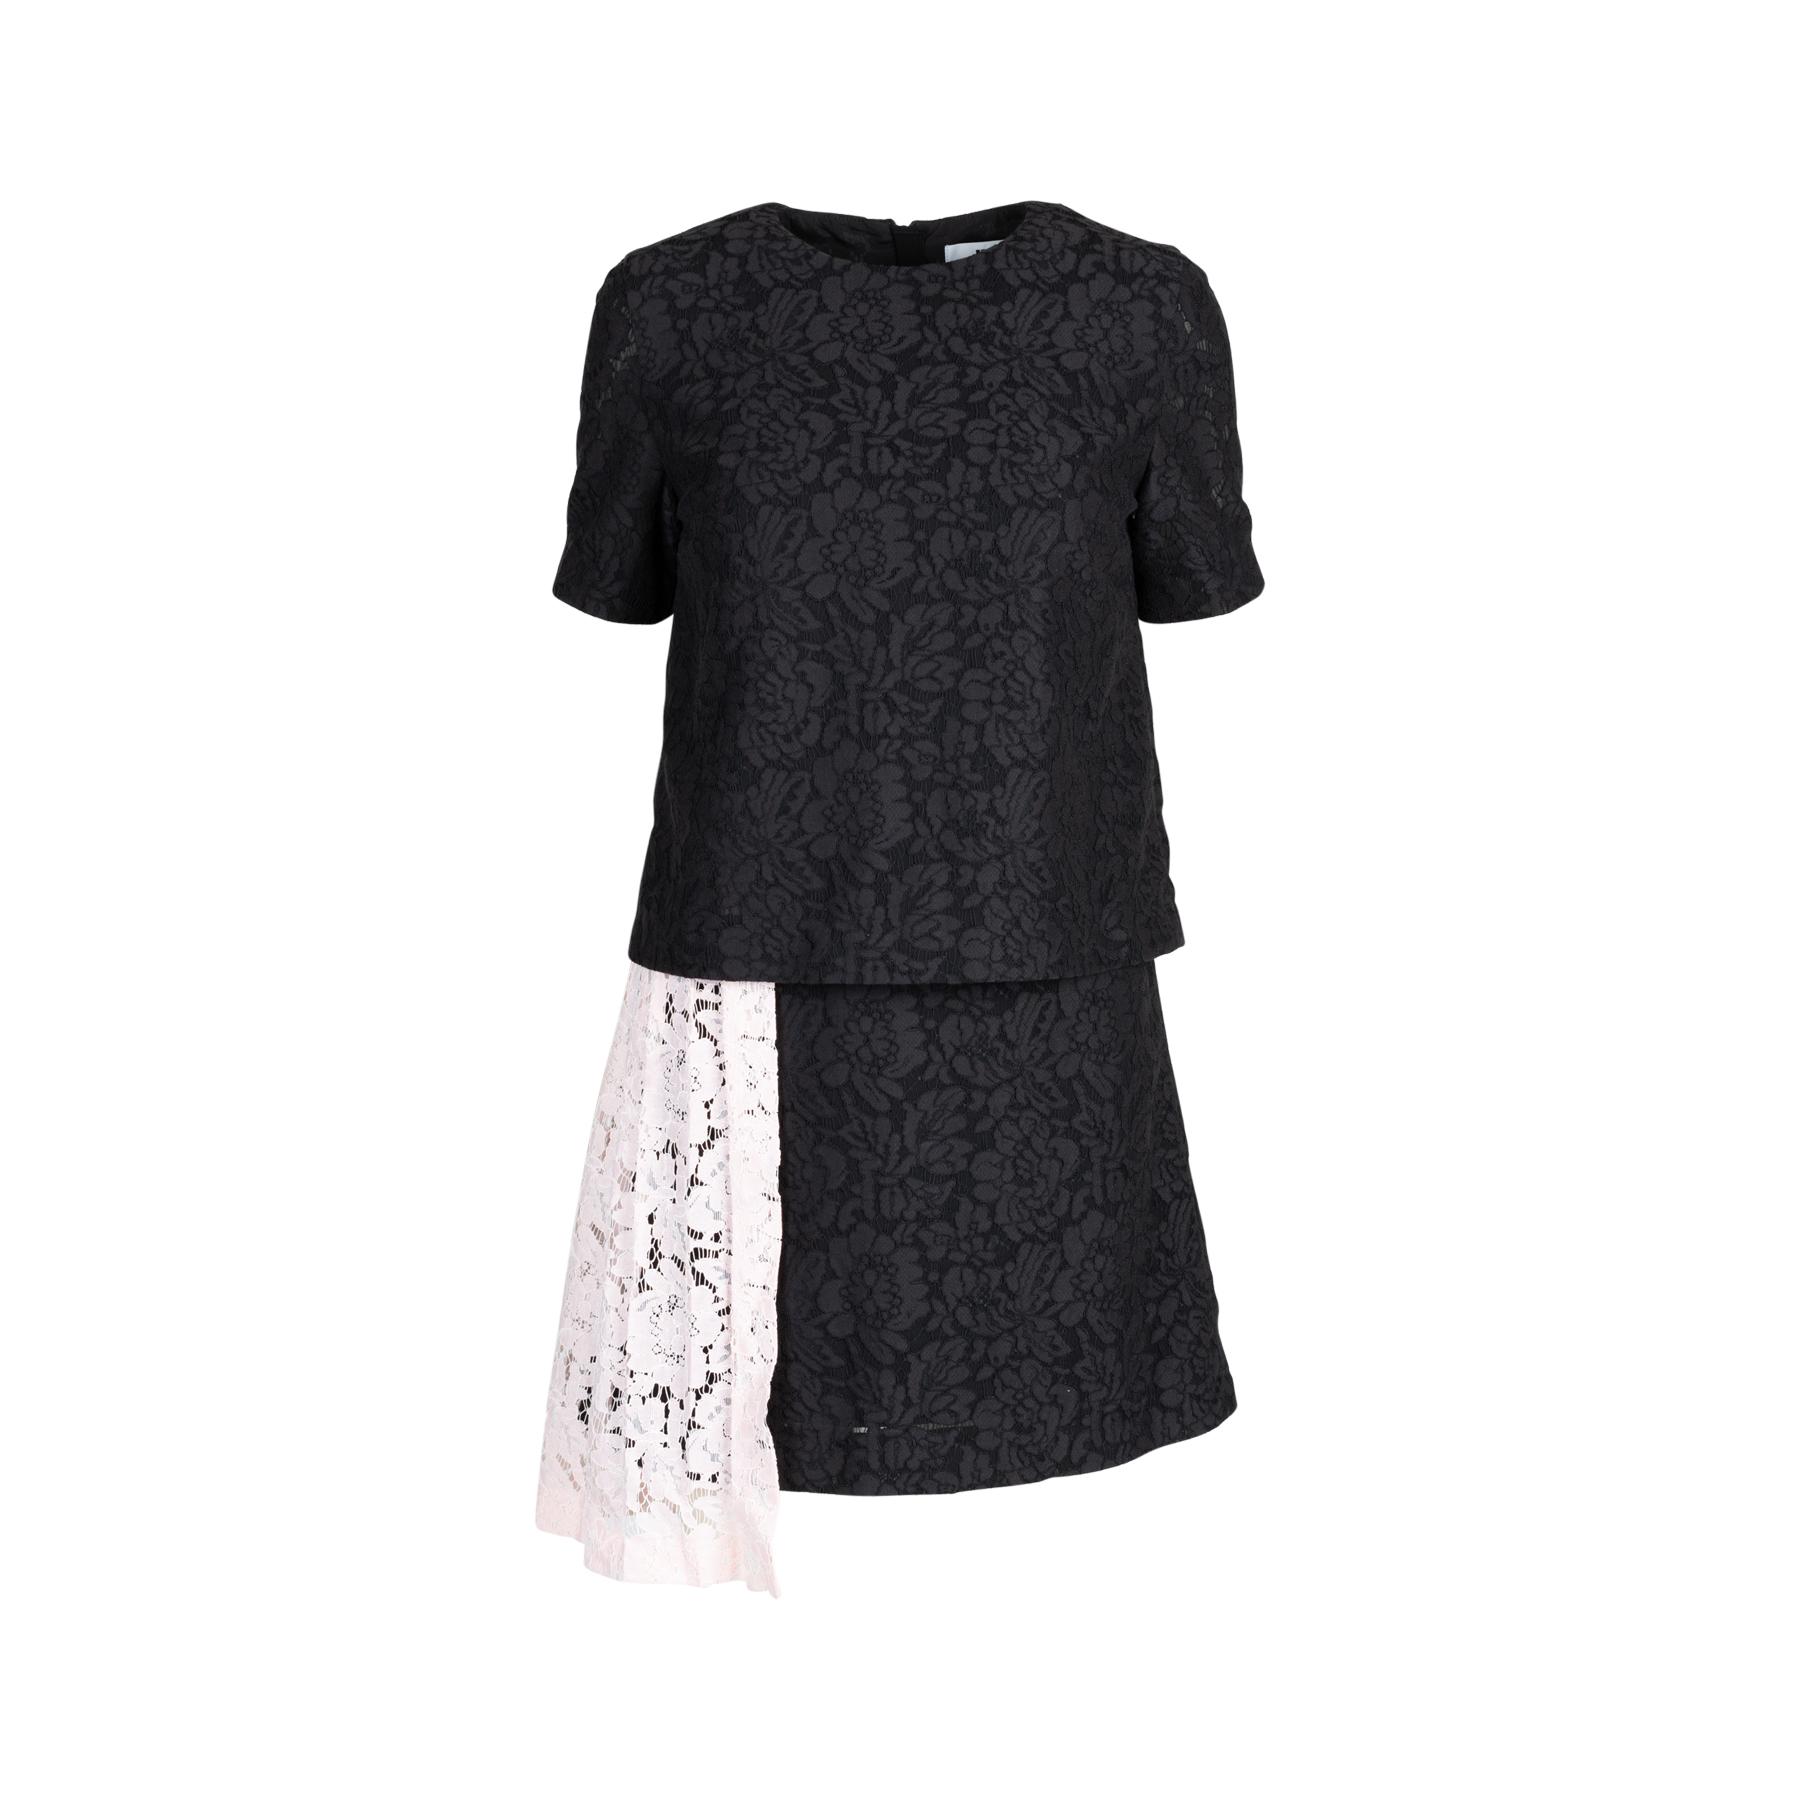 bb35c9dfcc6a Authentic Second Hand MSGM Contrast Panel Lace Dress (PSS-424-00109 ...